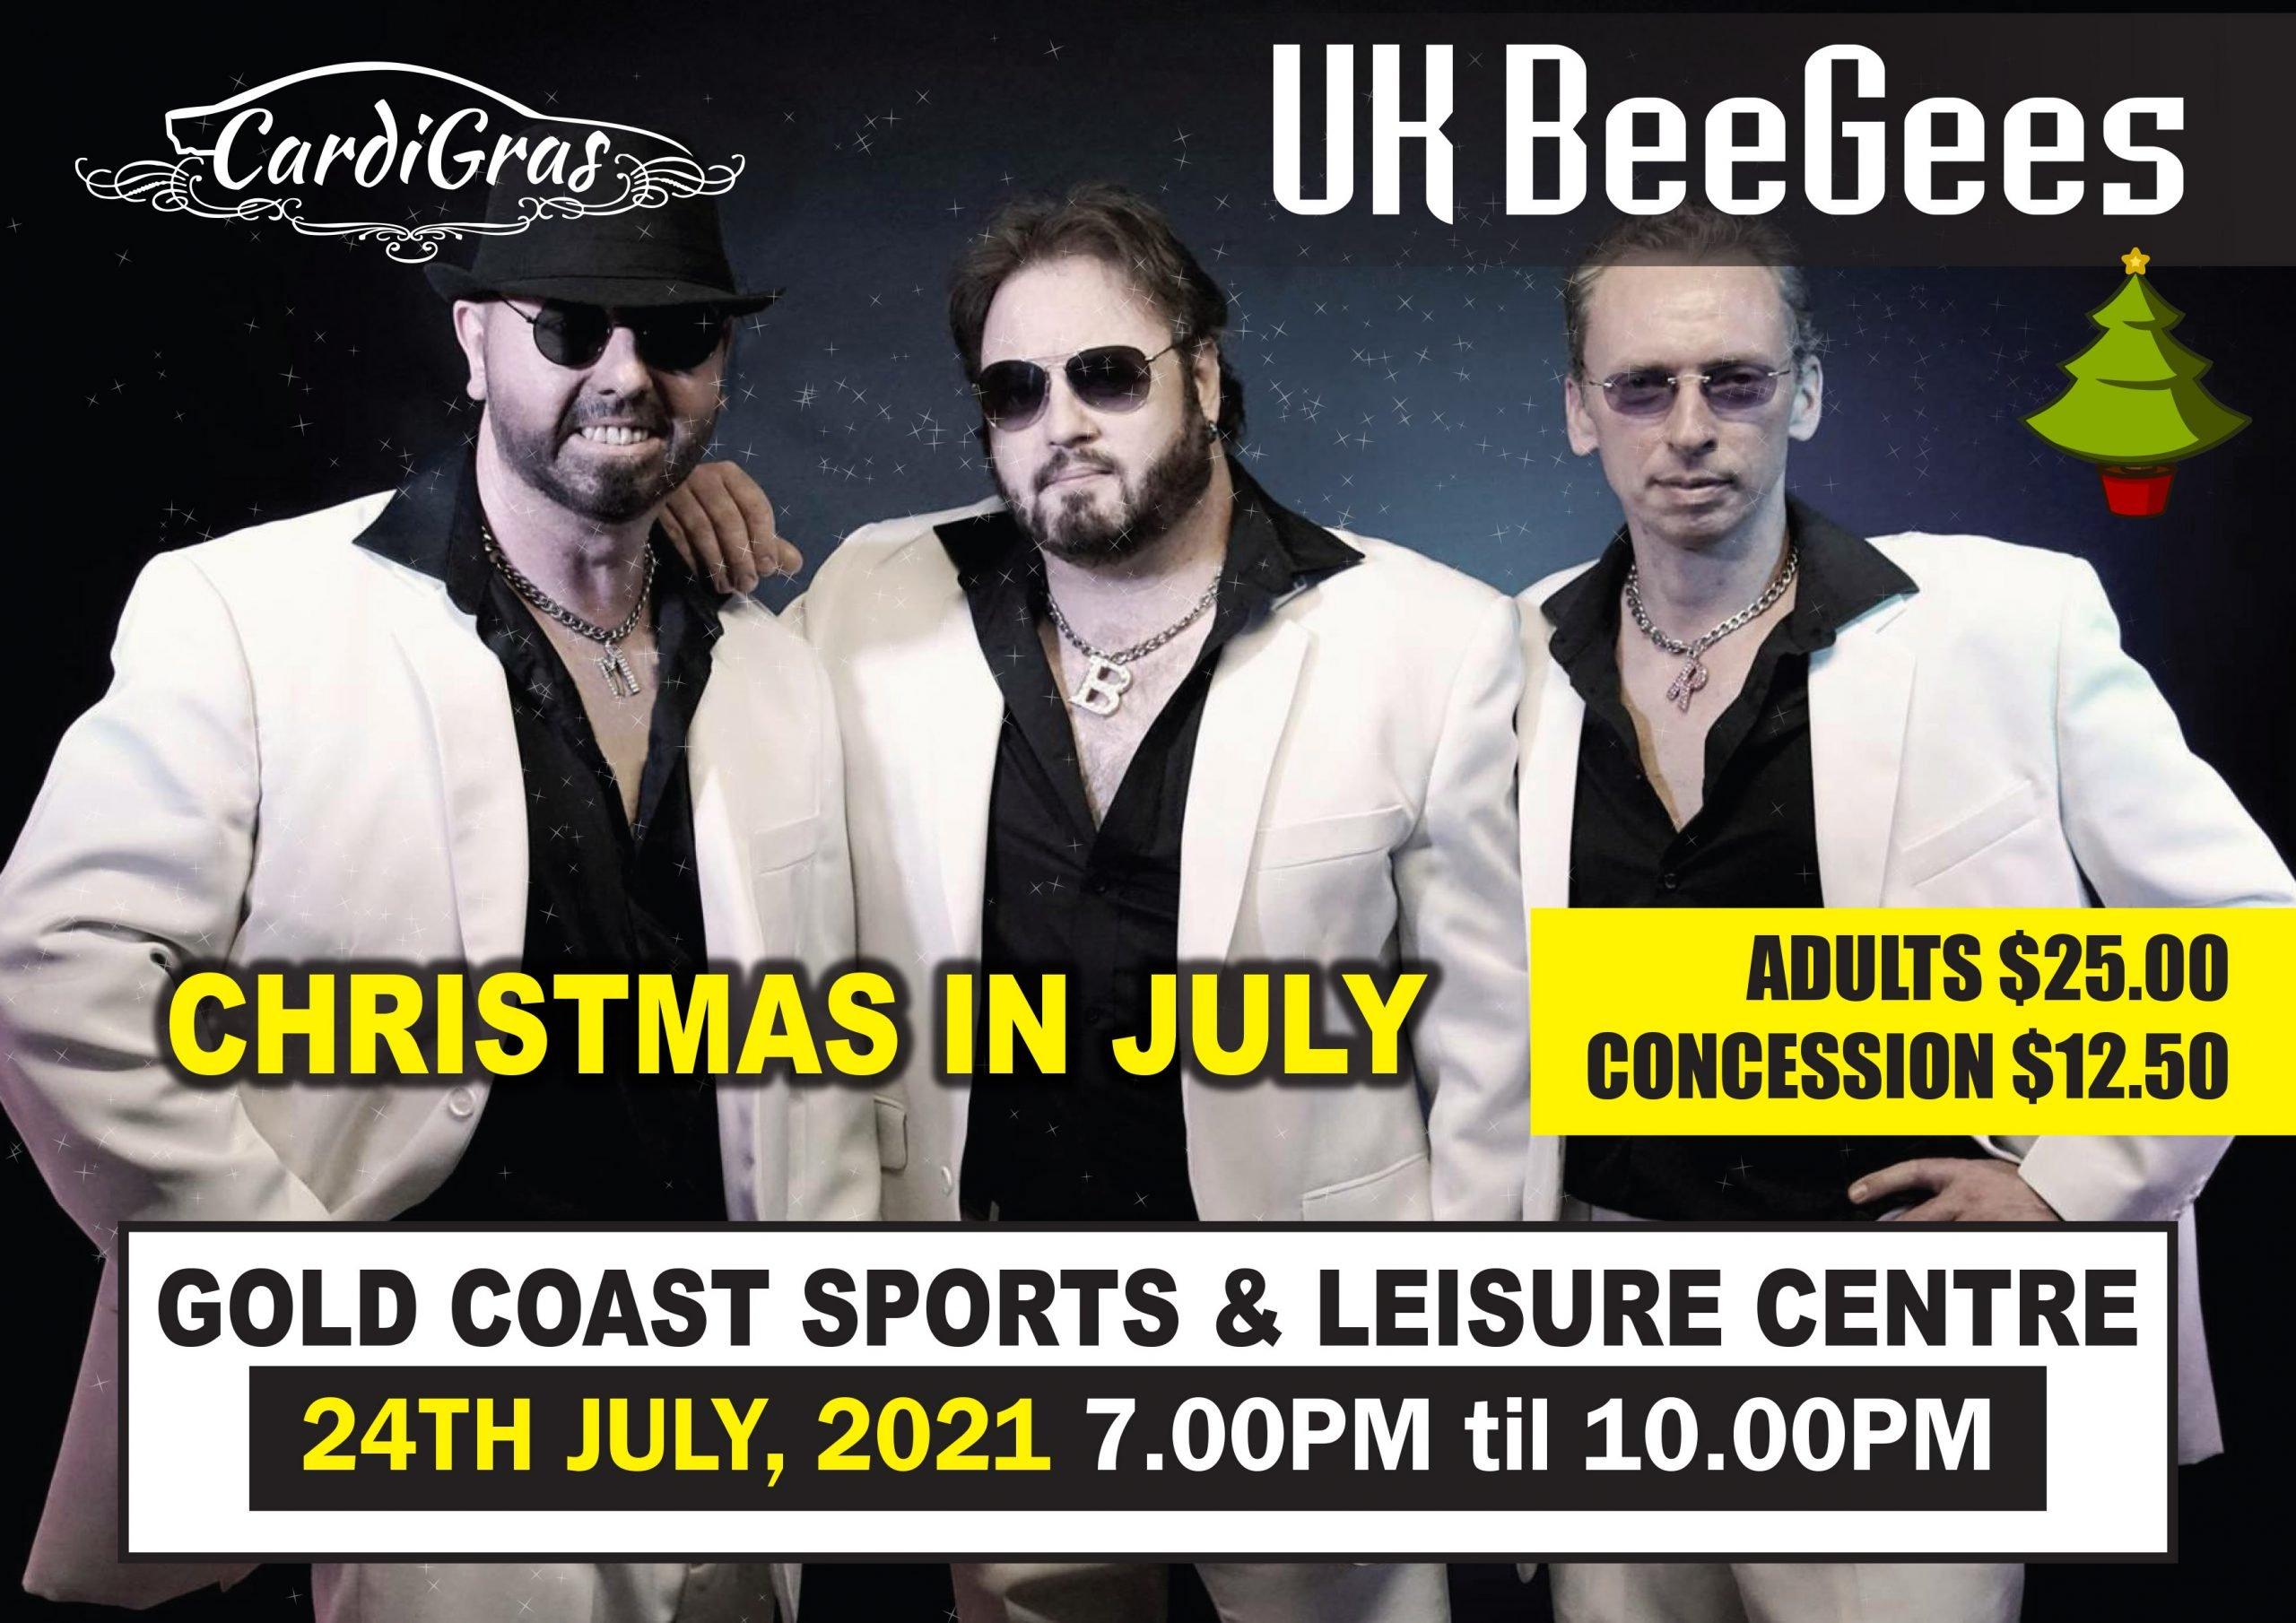 00AA Cardi Gras UK Bee Gees 240721 scaled